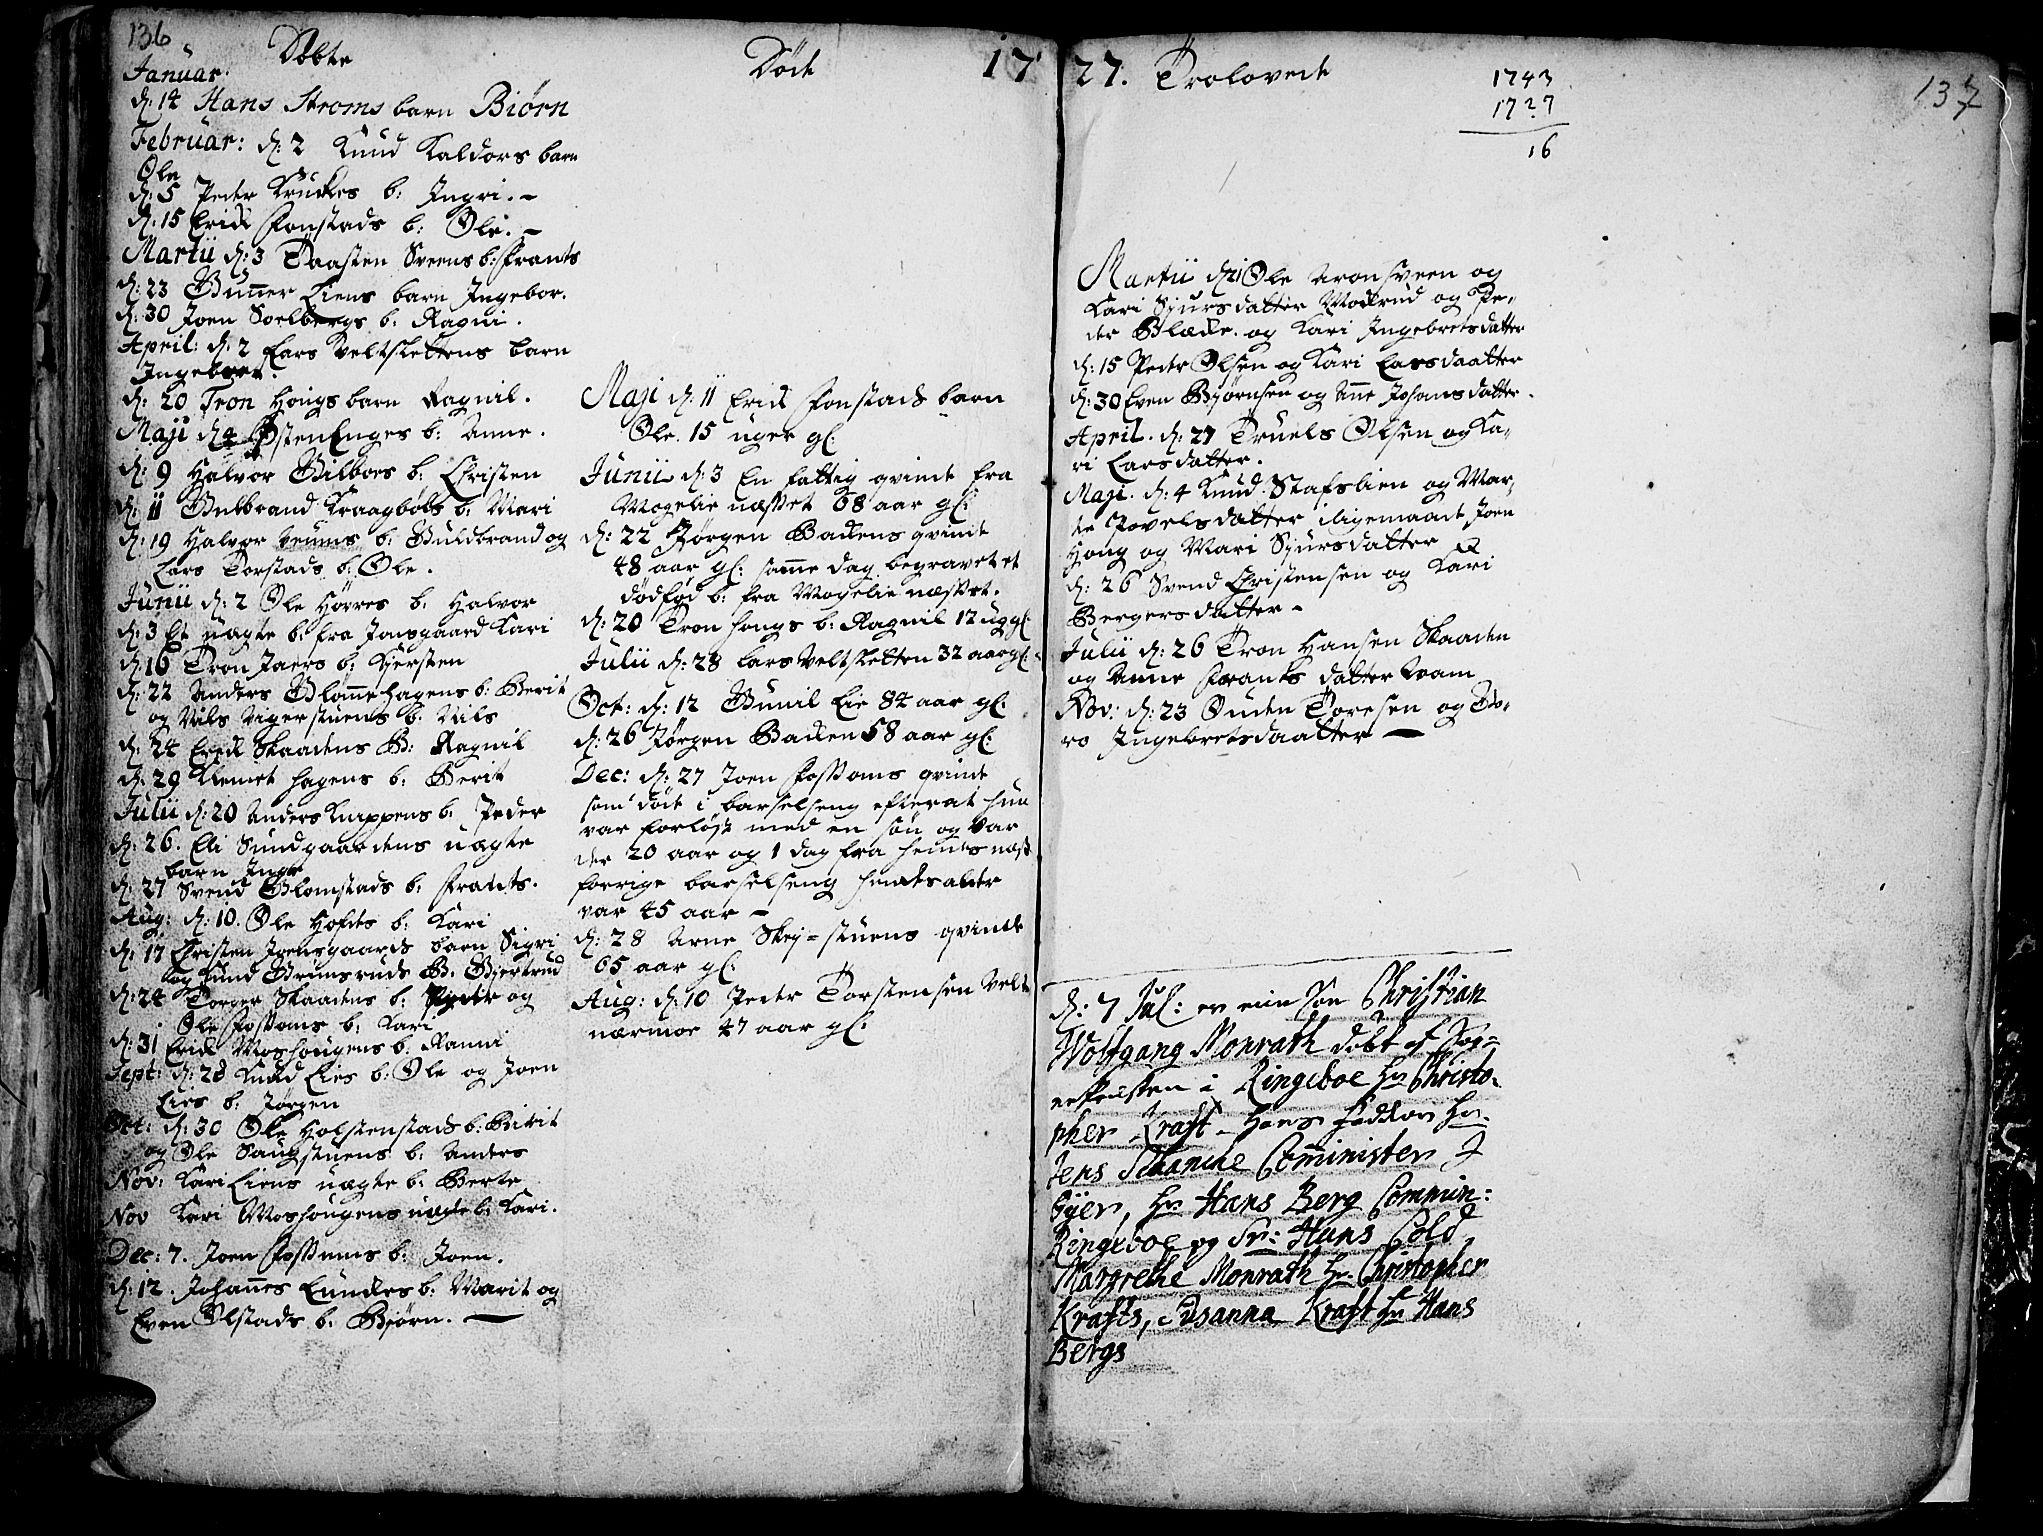 SAH, Øyer prestekontor, Ministerialbok nr. 1, 1671-1727, s. 136-137